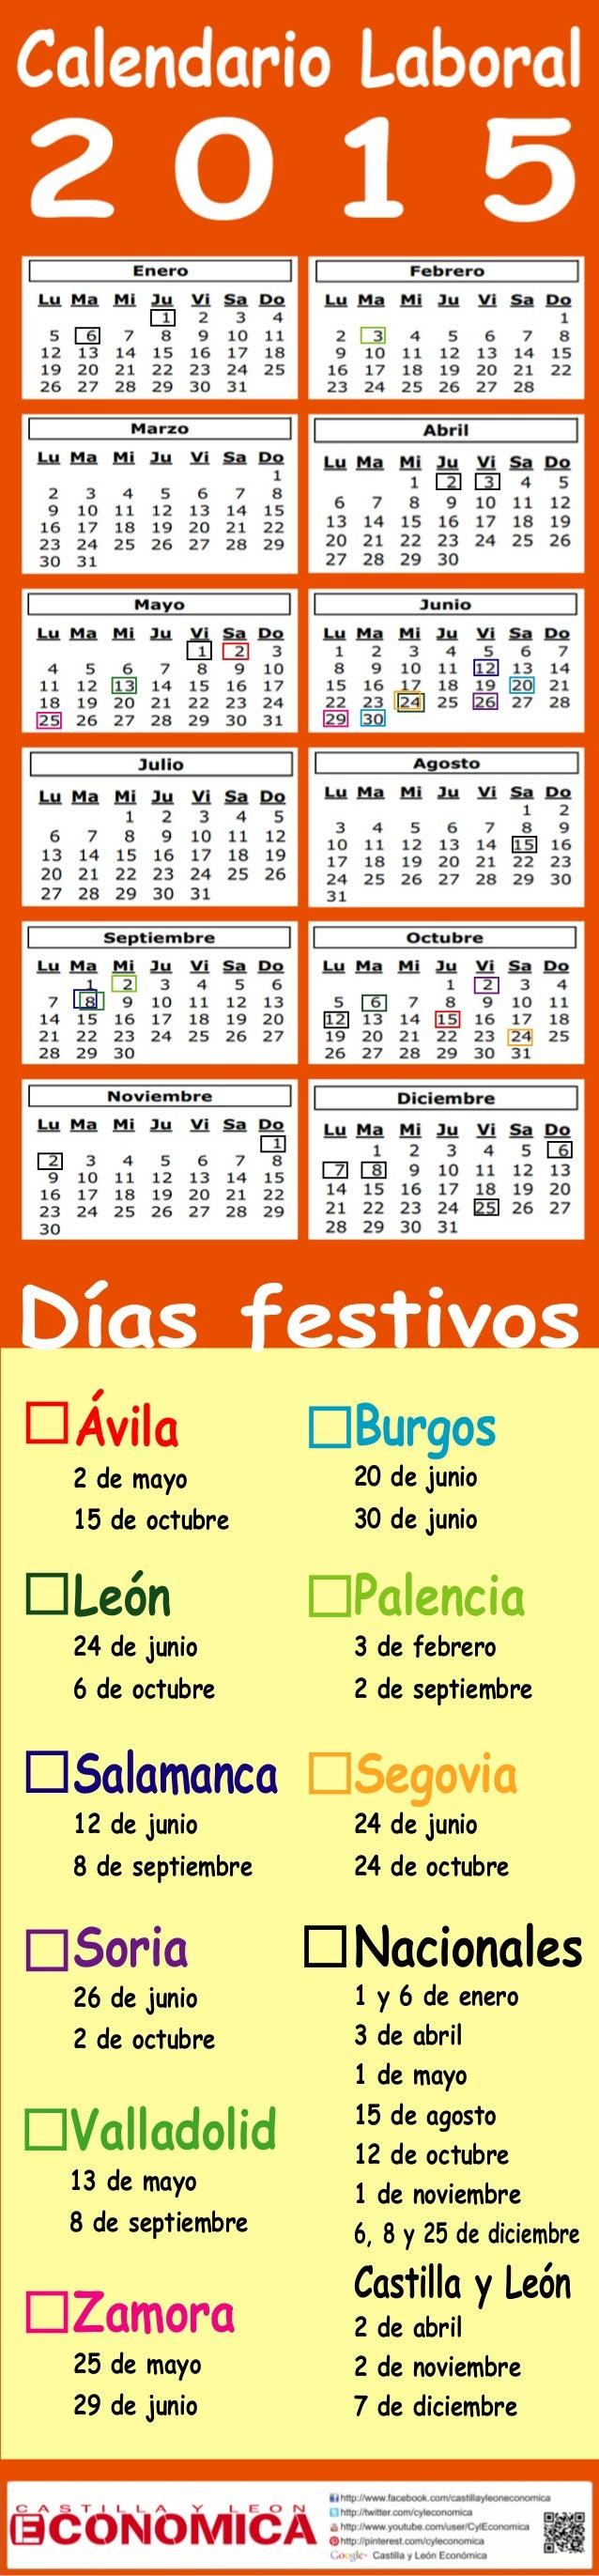 Días festivos  Ávila  2 de mayo  15 de octubre  Burgos  20 de junio  30 de junio  León  24 de junio  6 de octubre  Palenci...